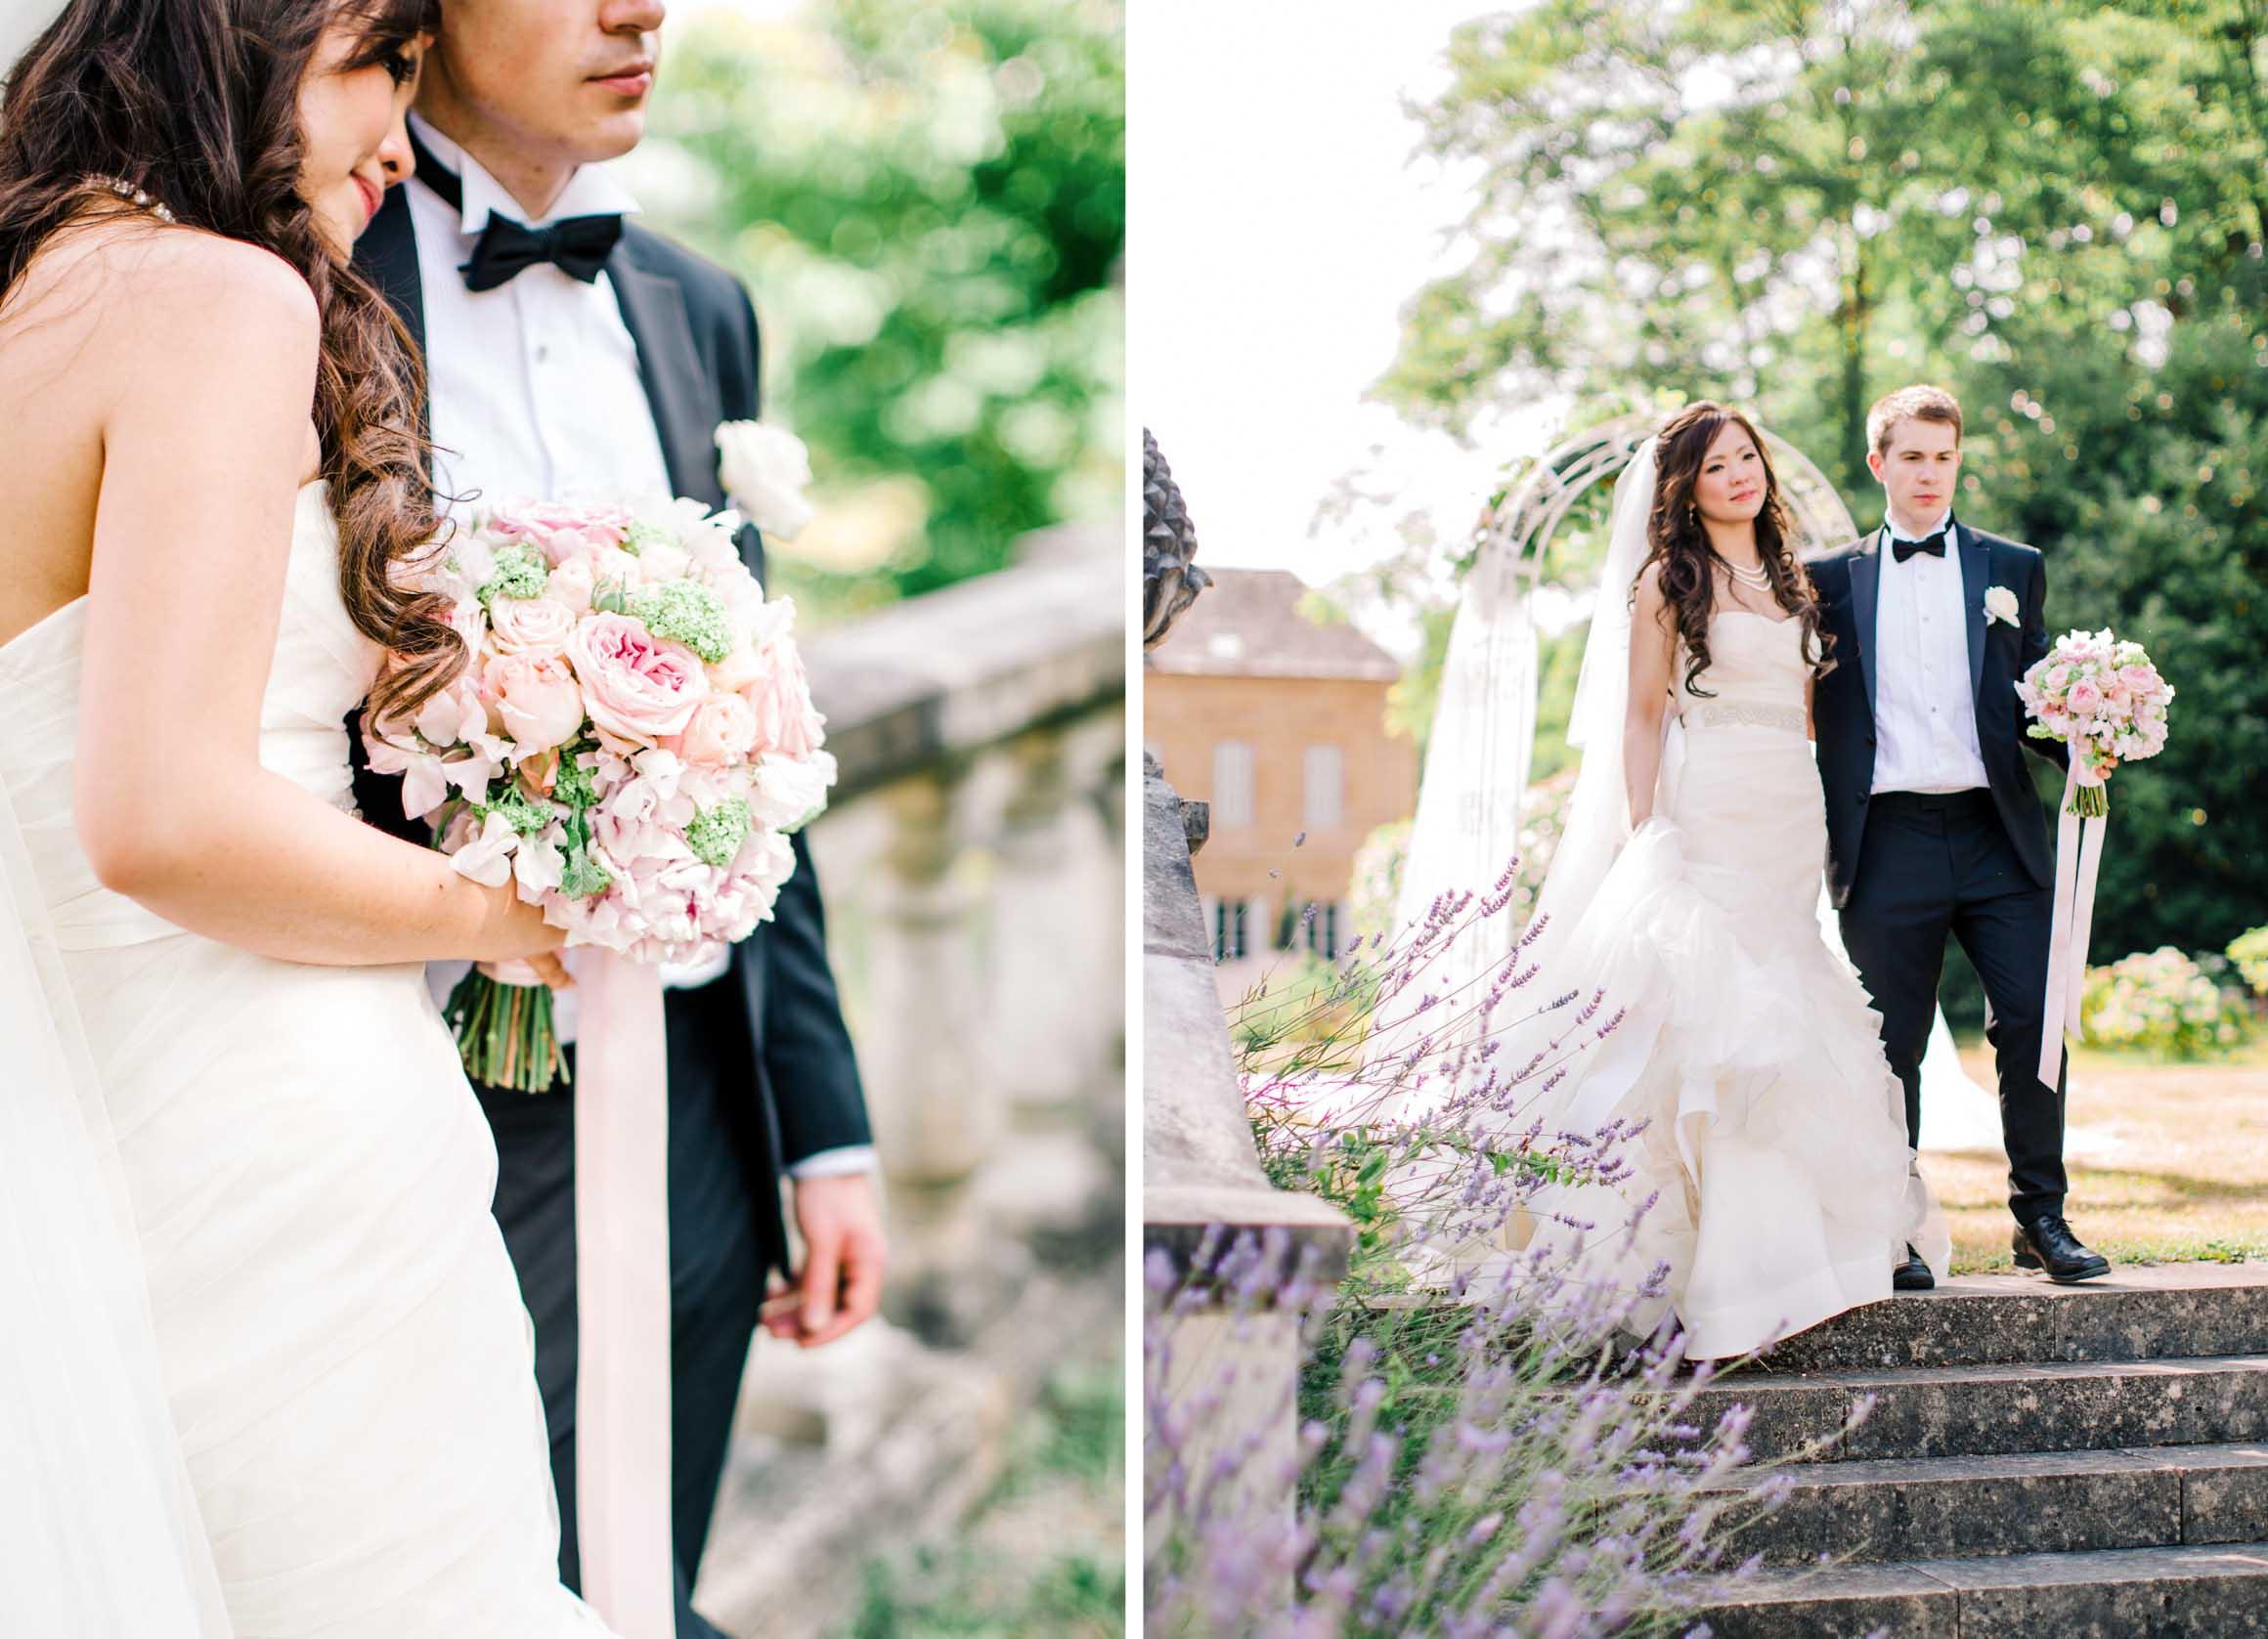 Amy O'Boyle Photography- Destination & UK Fine Art Film Wedding Photographer- Chateau La Durantie Wedding 10.jpg